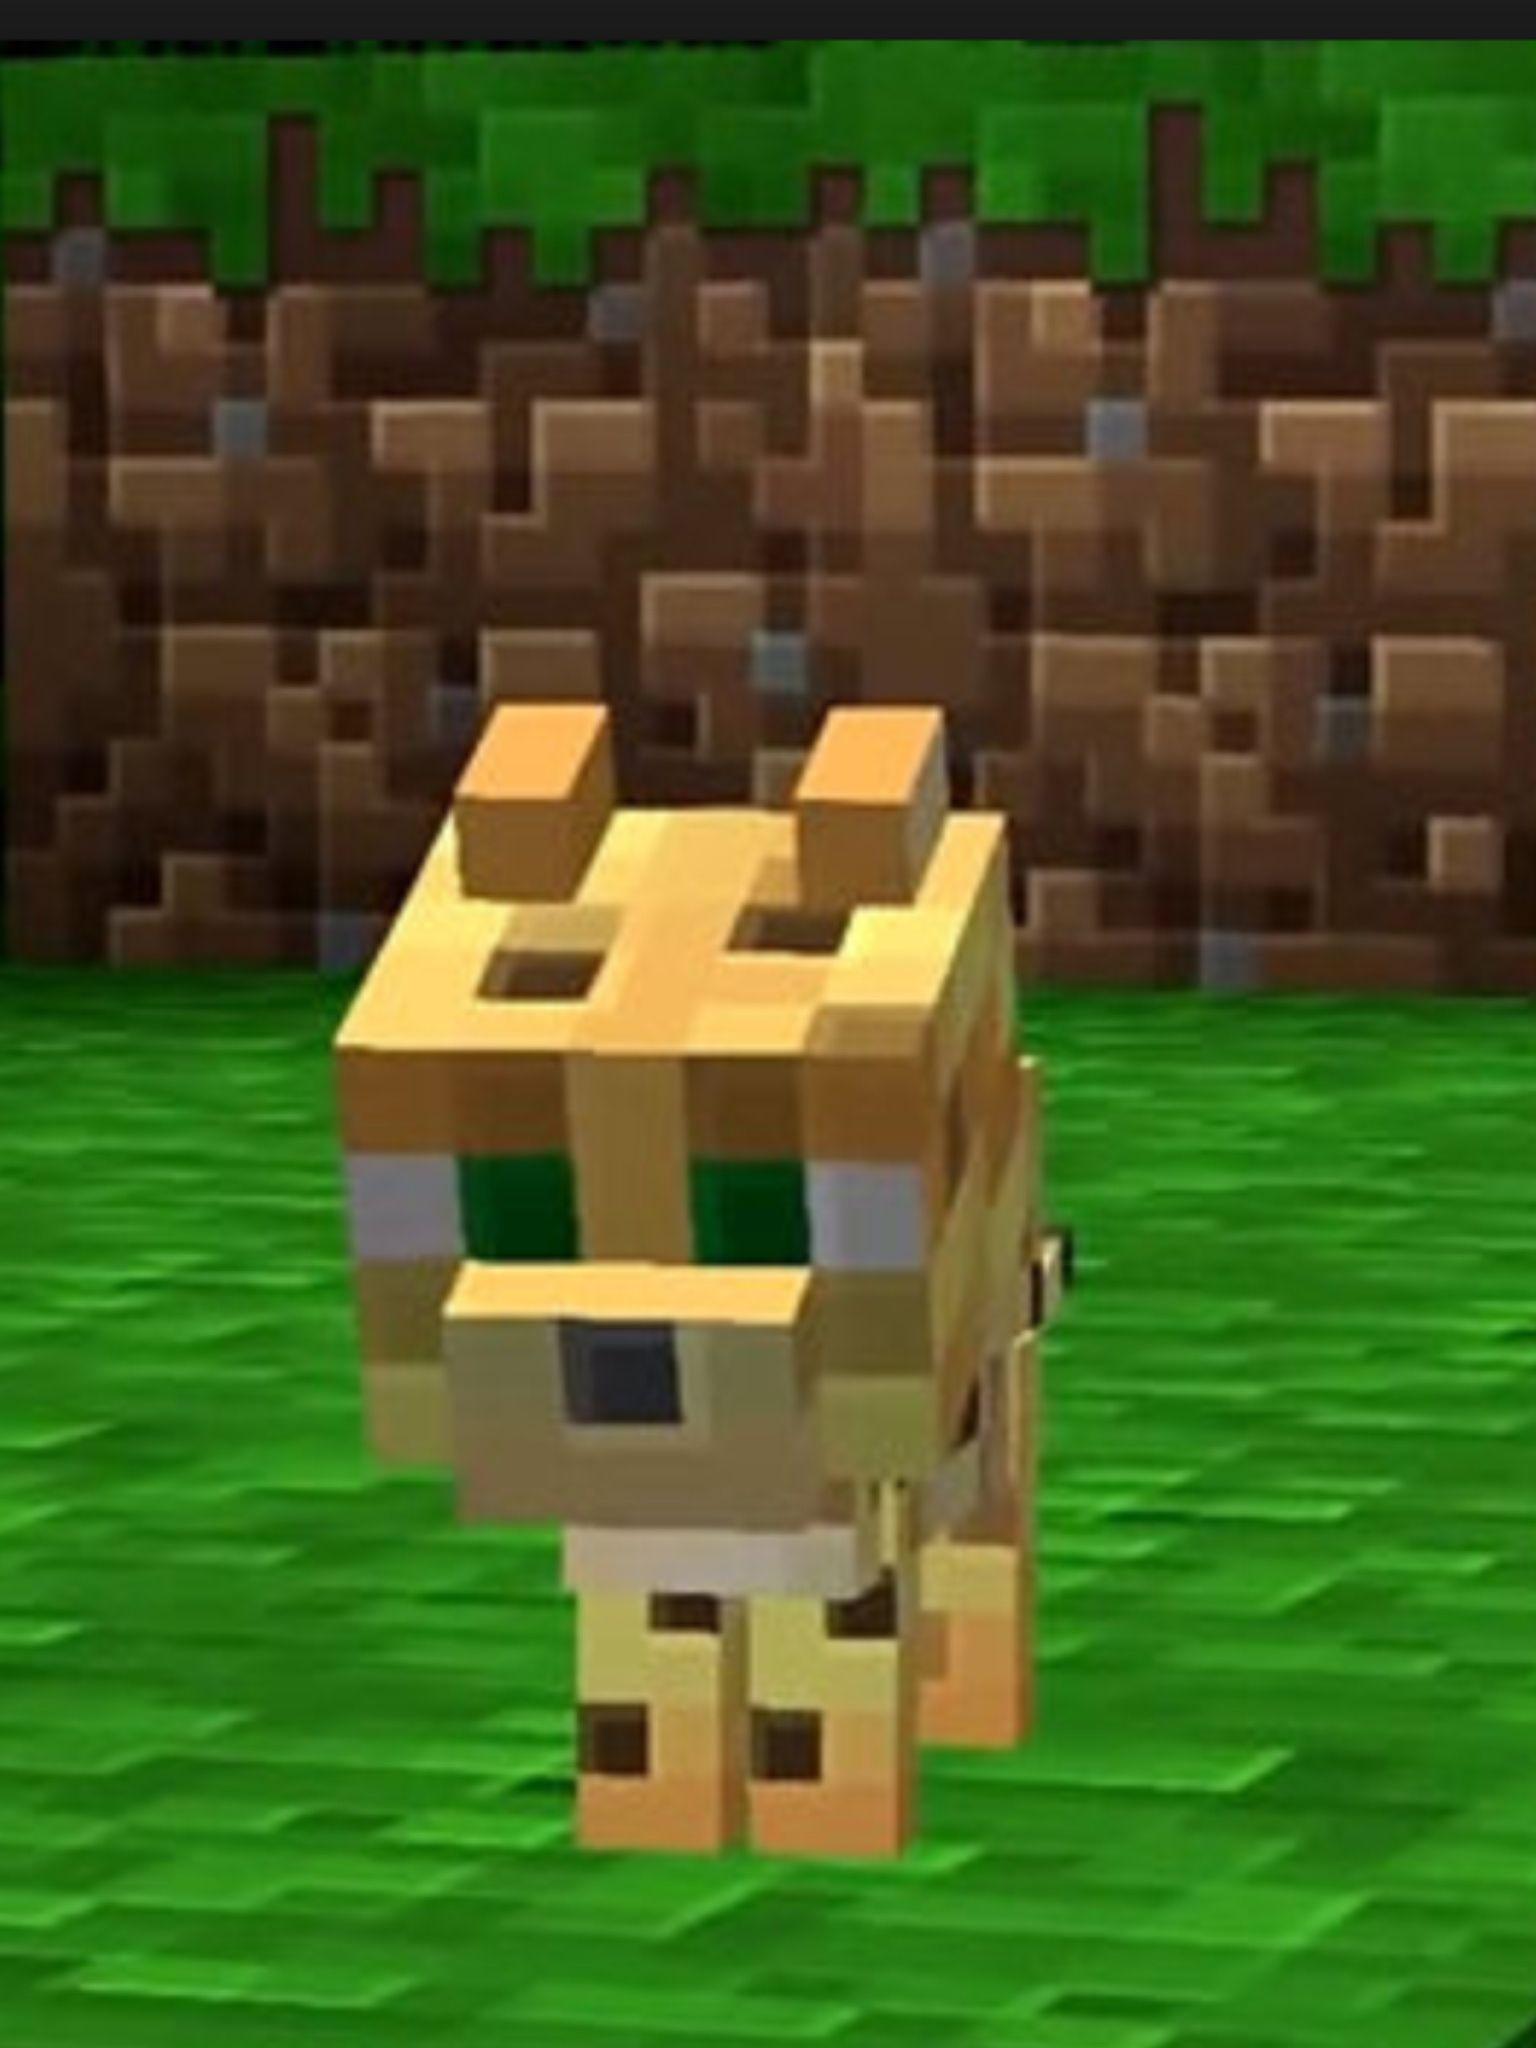 I Love This Cute Little Ocelot Minecraft Minecraft